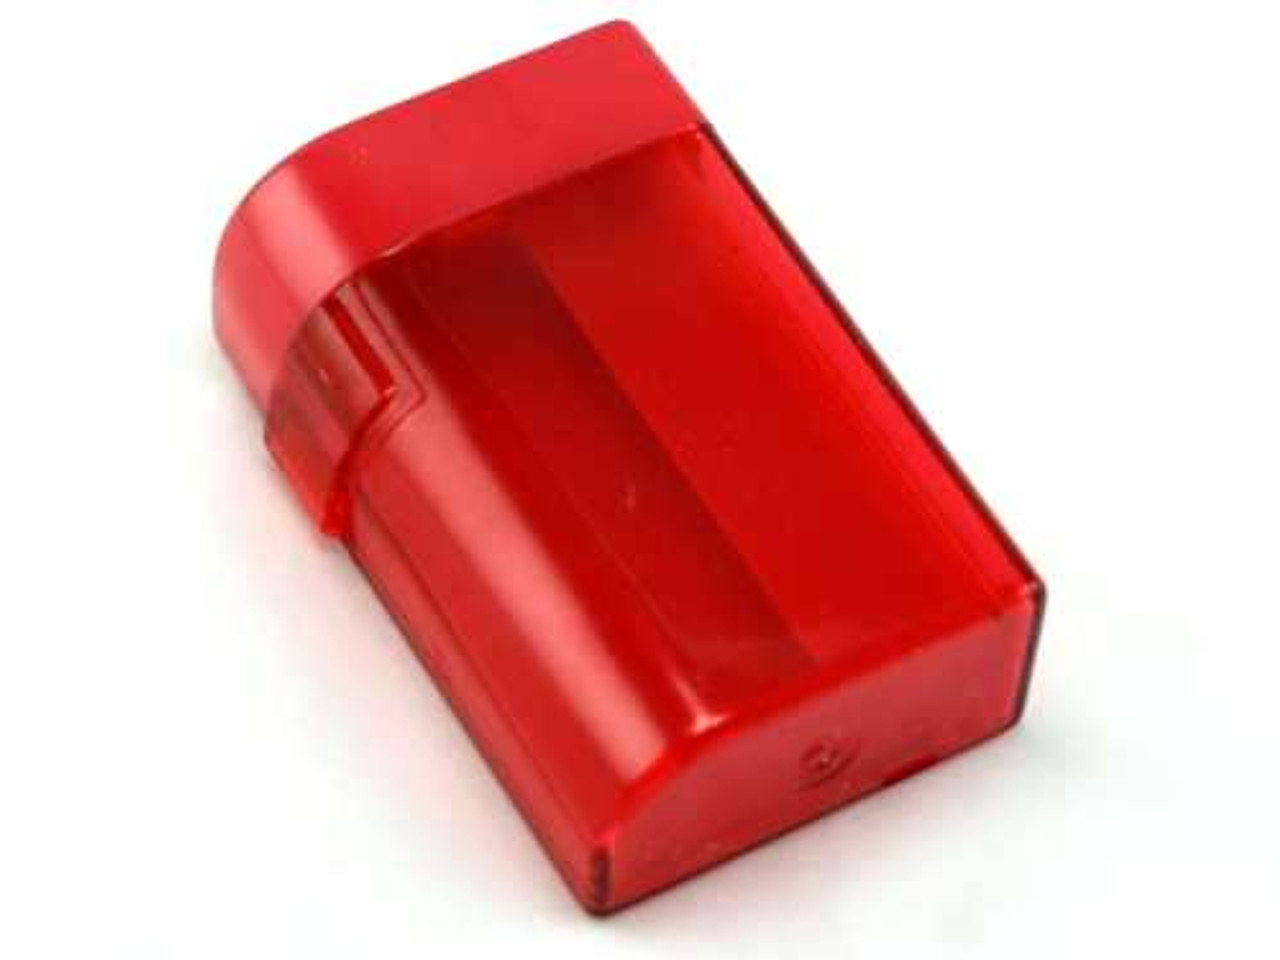 Clear Red Plastic Cigarette Case